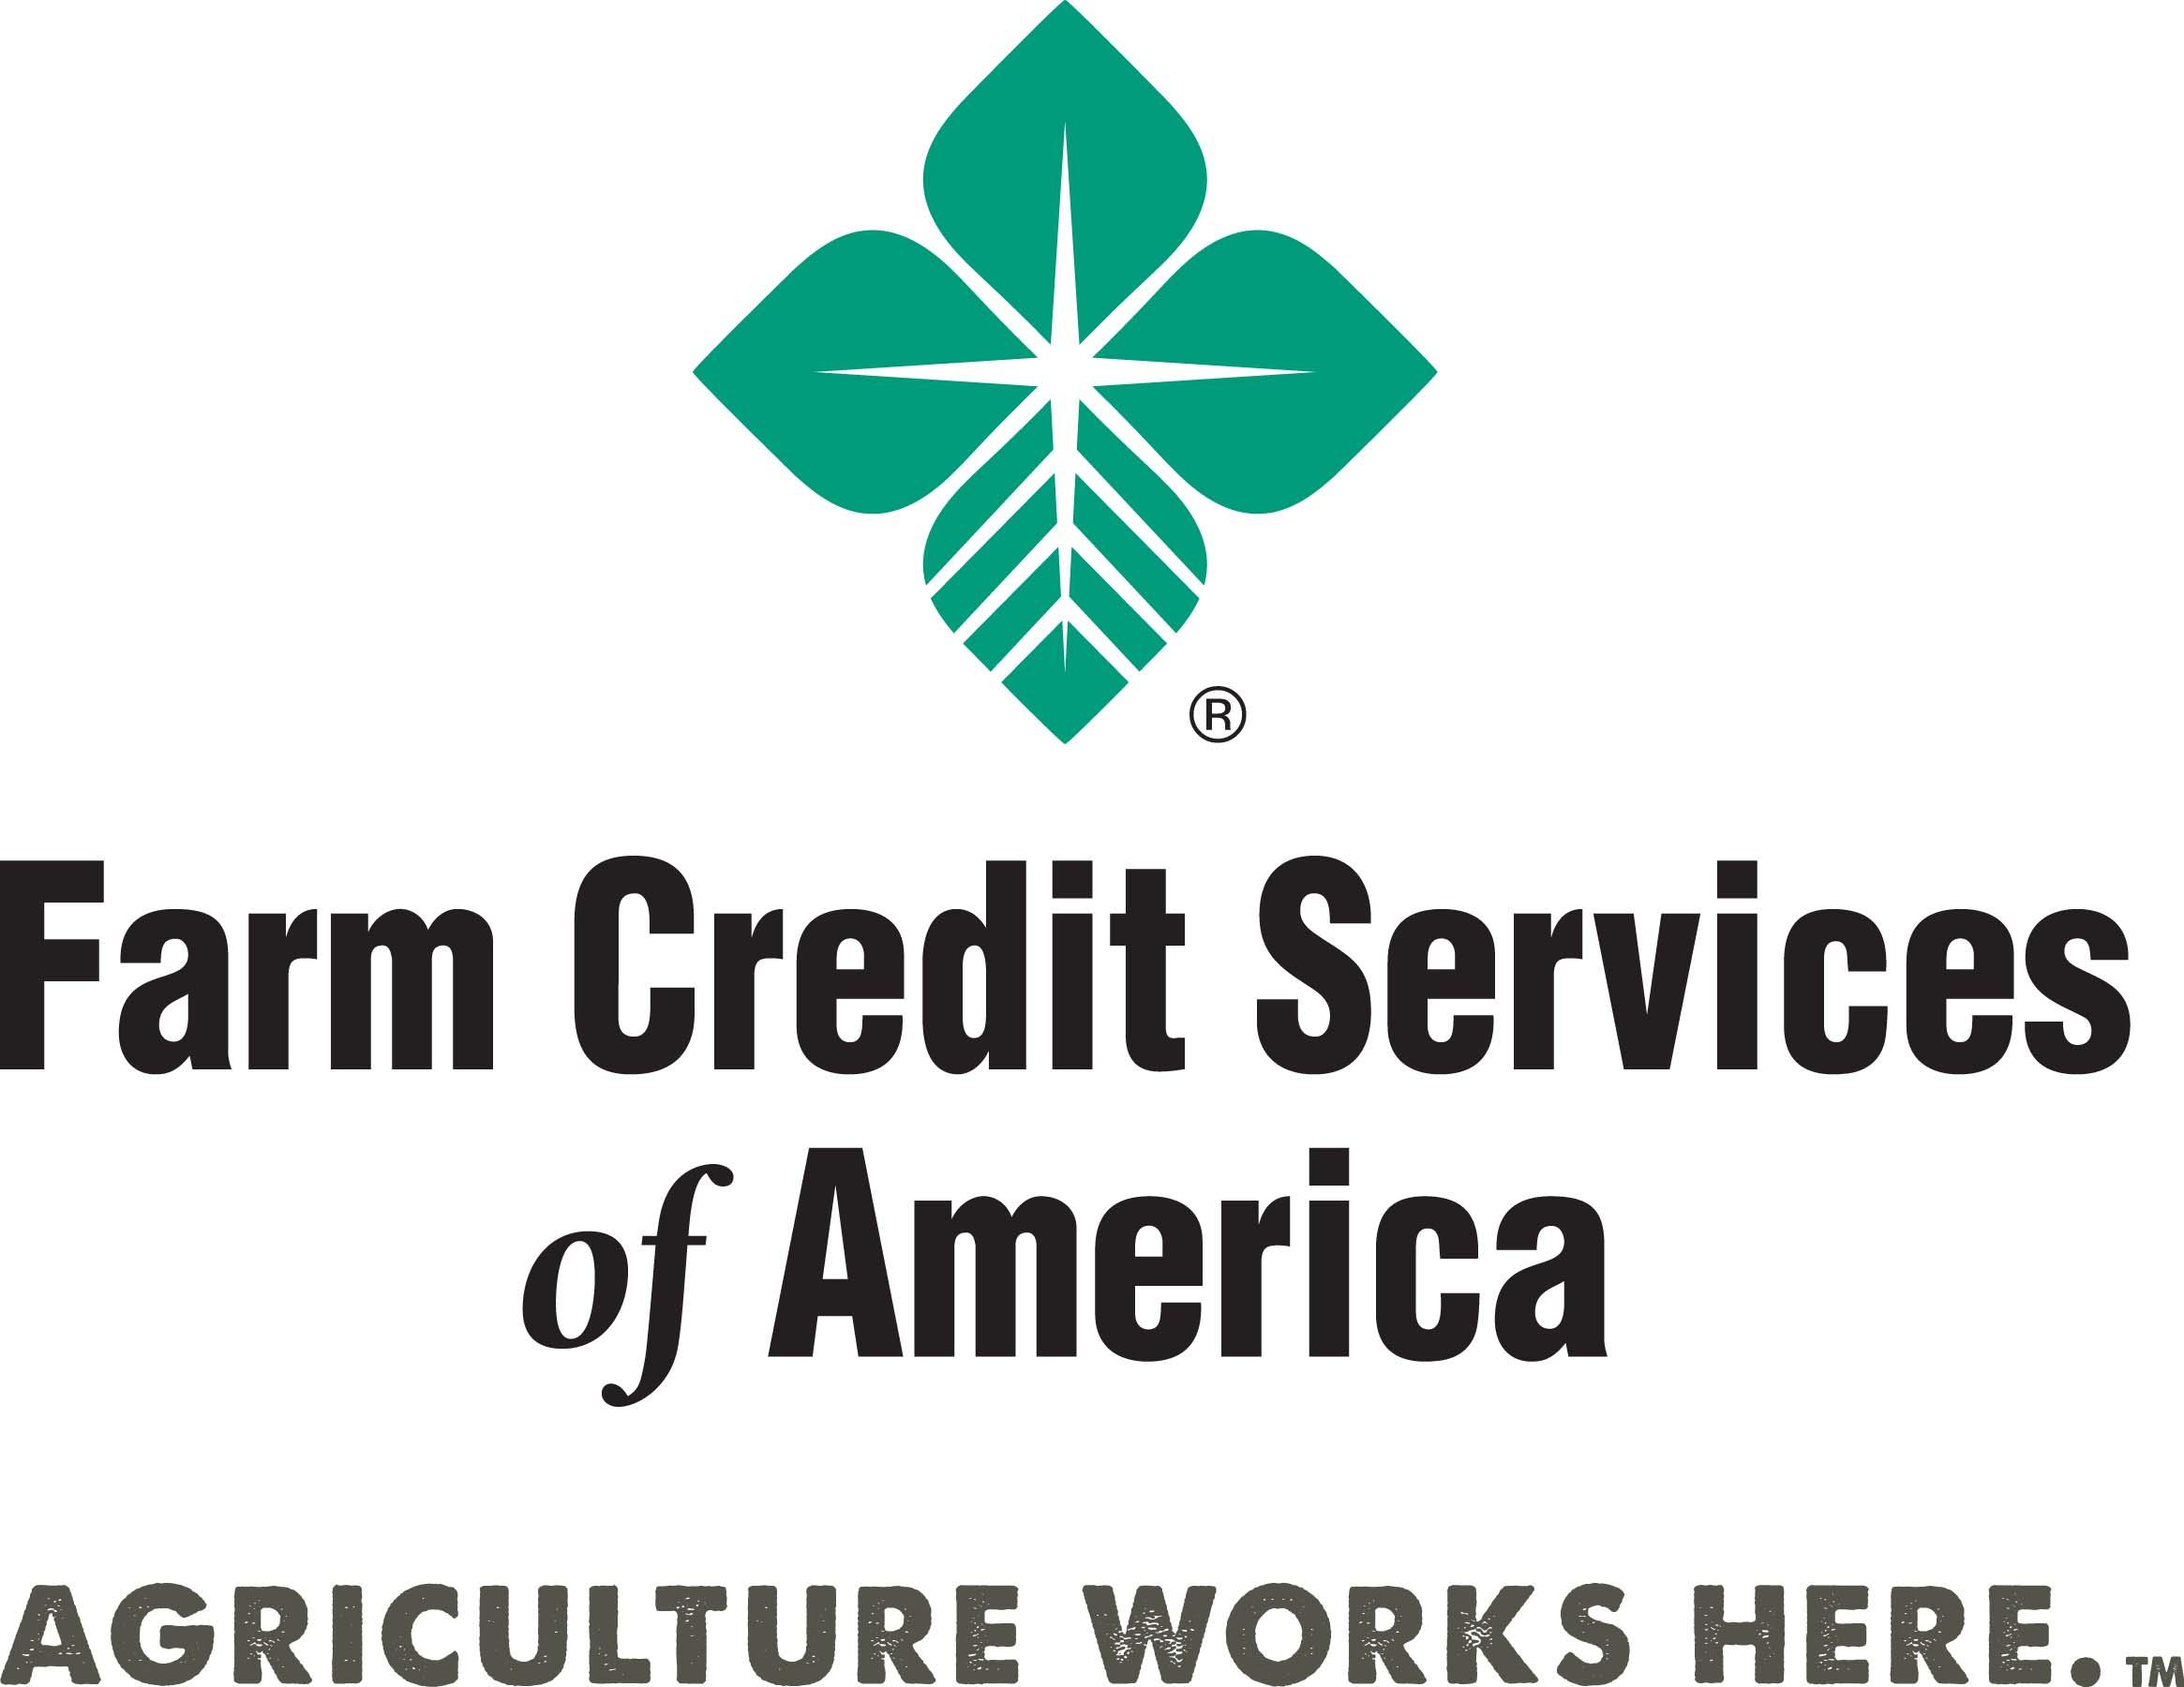 Farm Credit Services of America